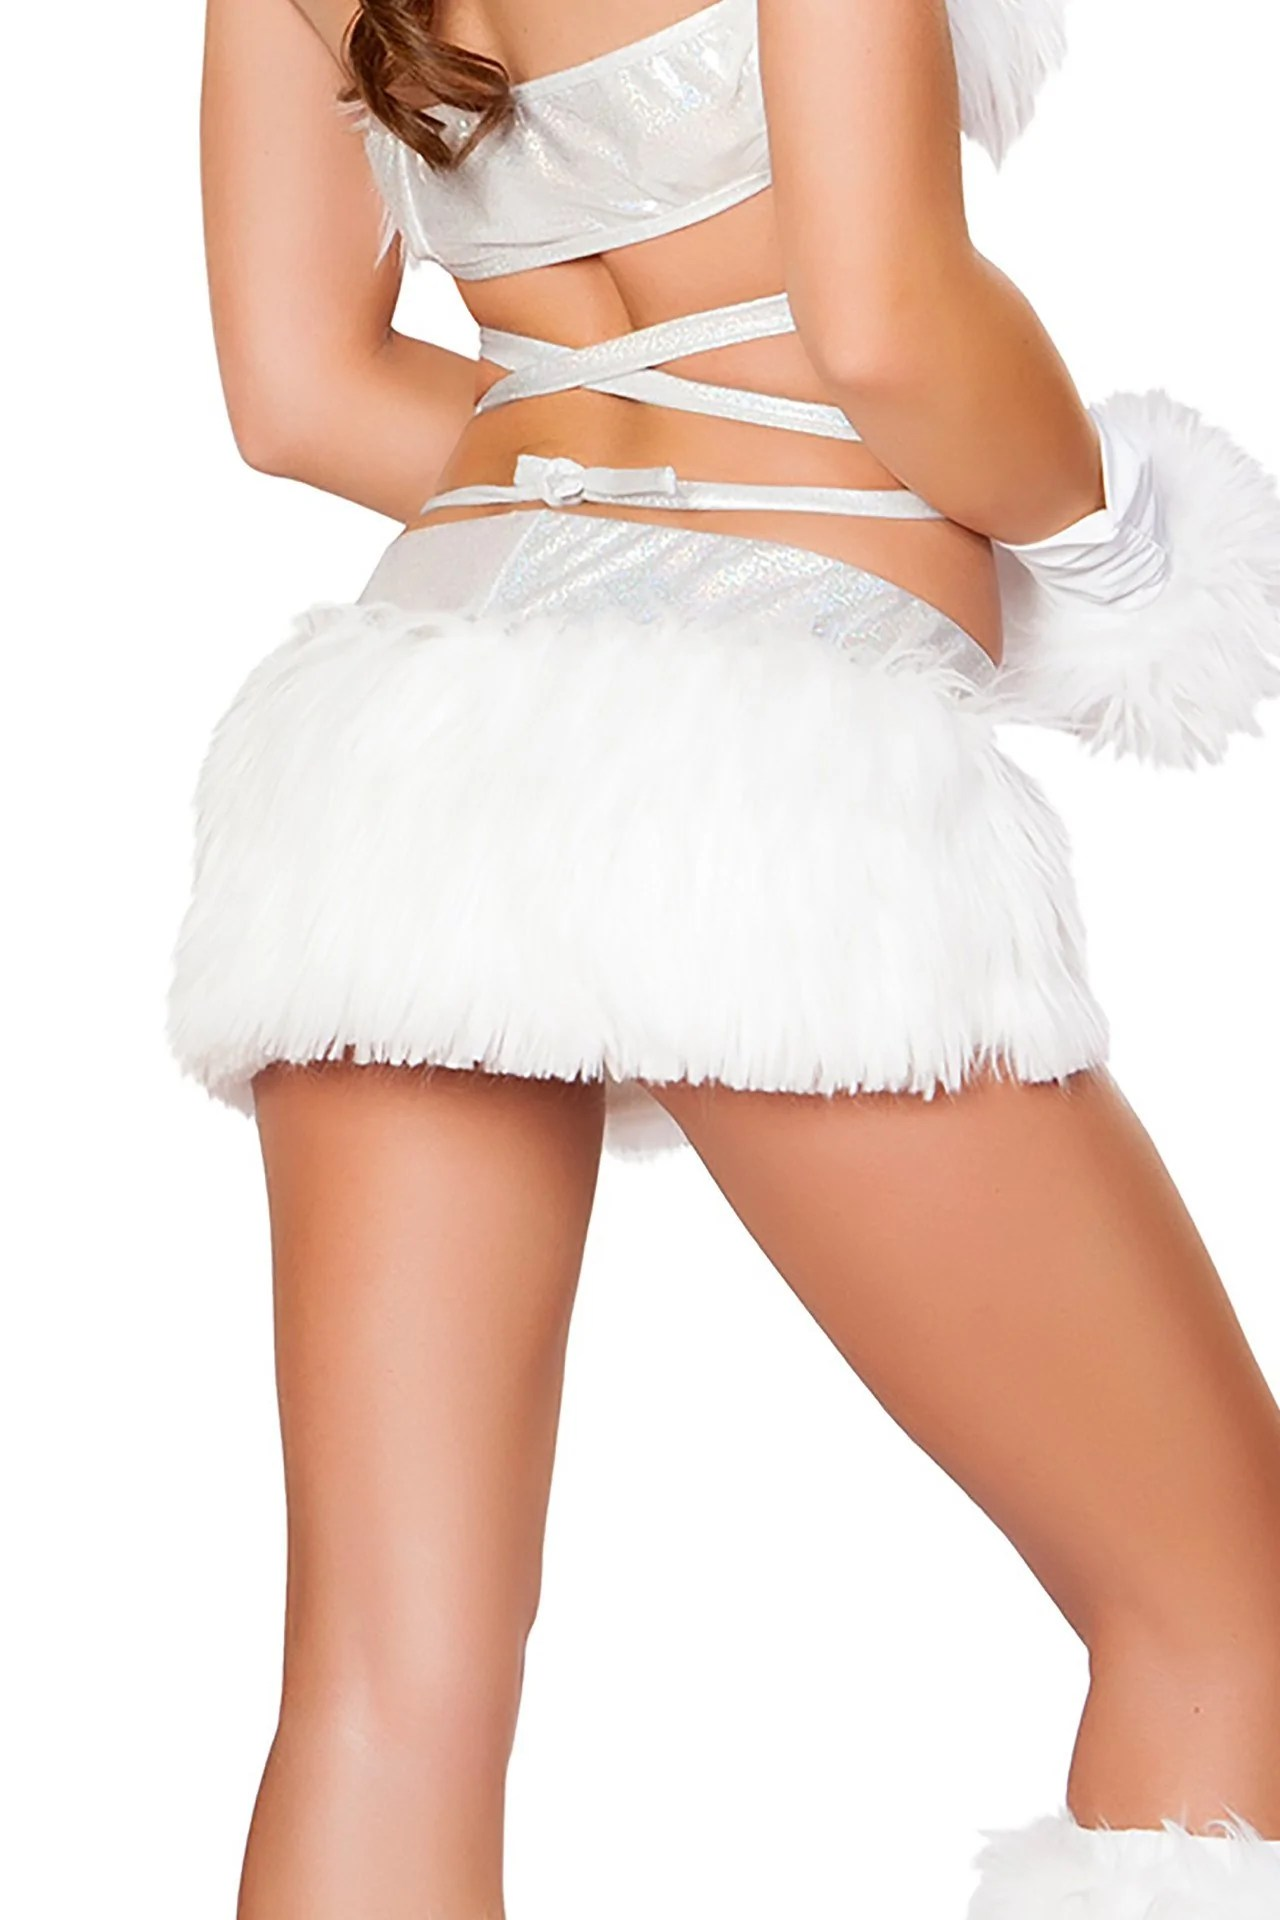 J Valentine Light Up Skirt With Led Lights Light Up